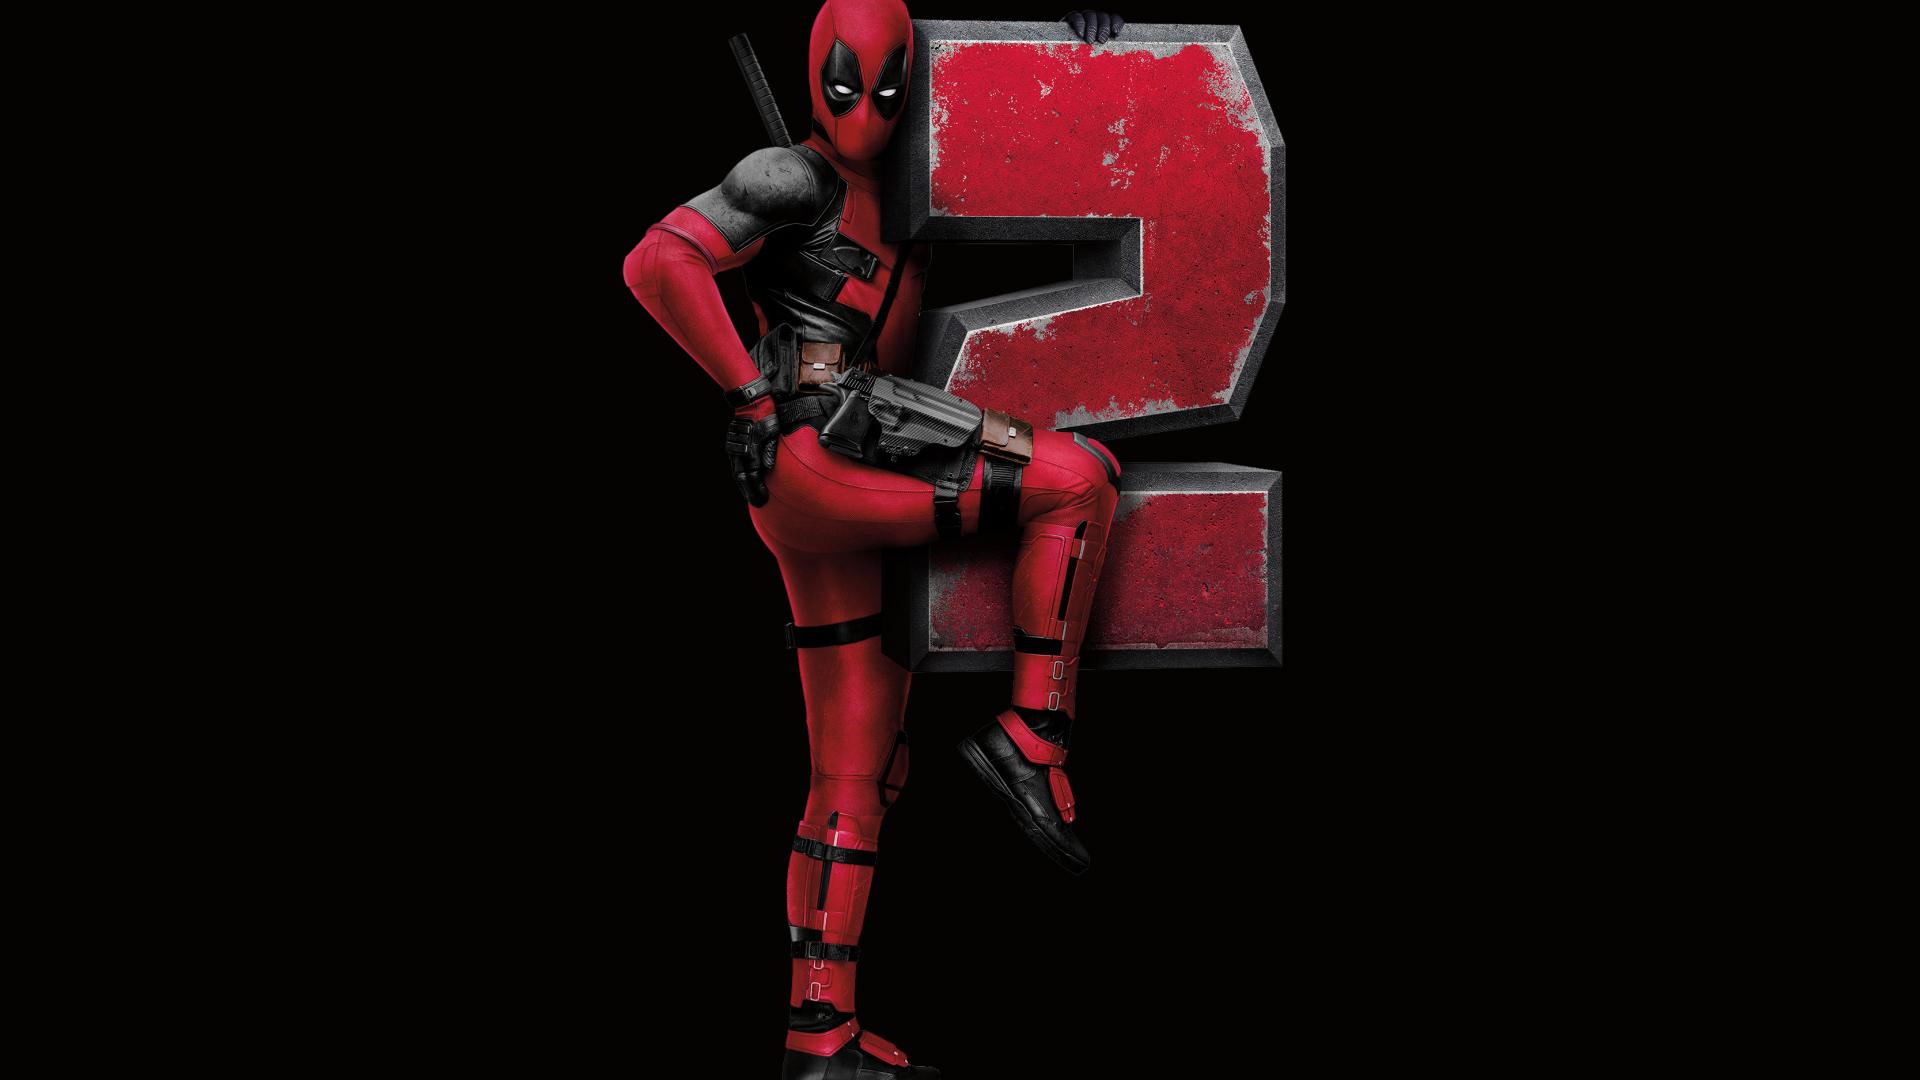 Download Deadpool 2 Ryan Reynolds Poster 1920x1080